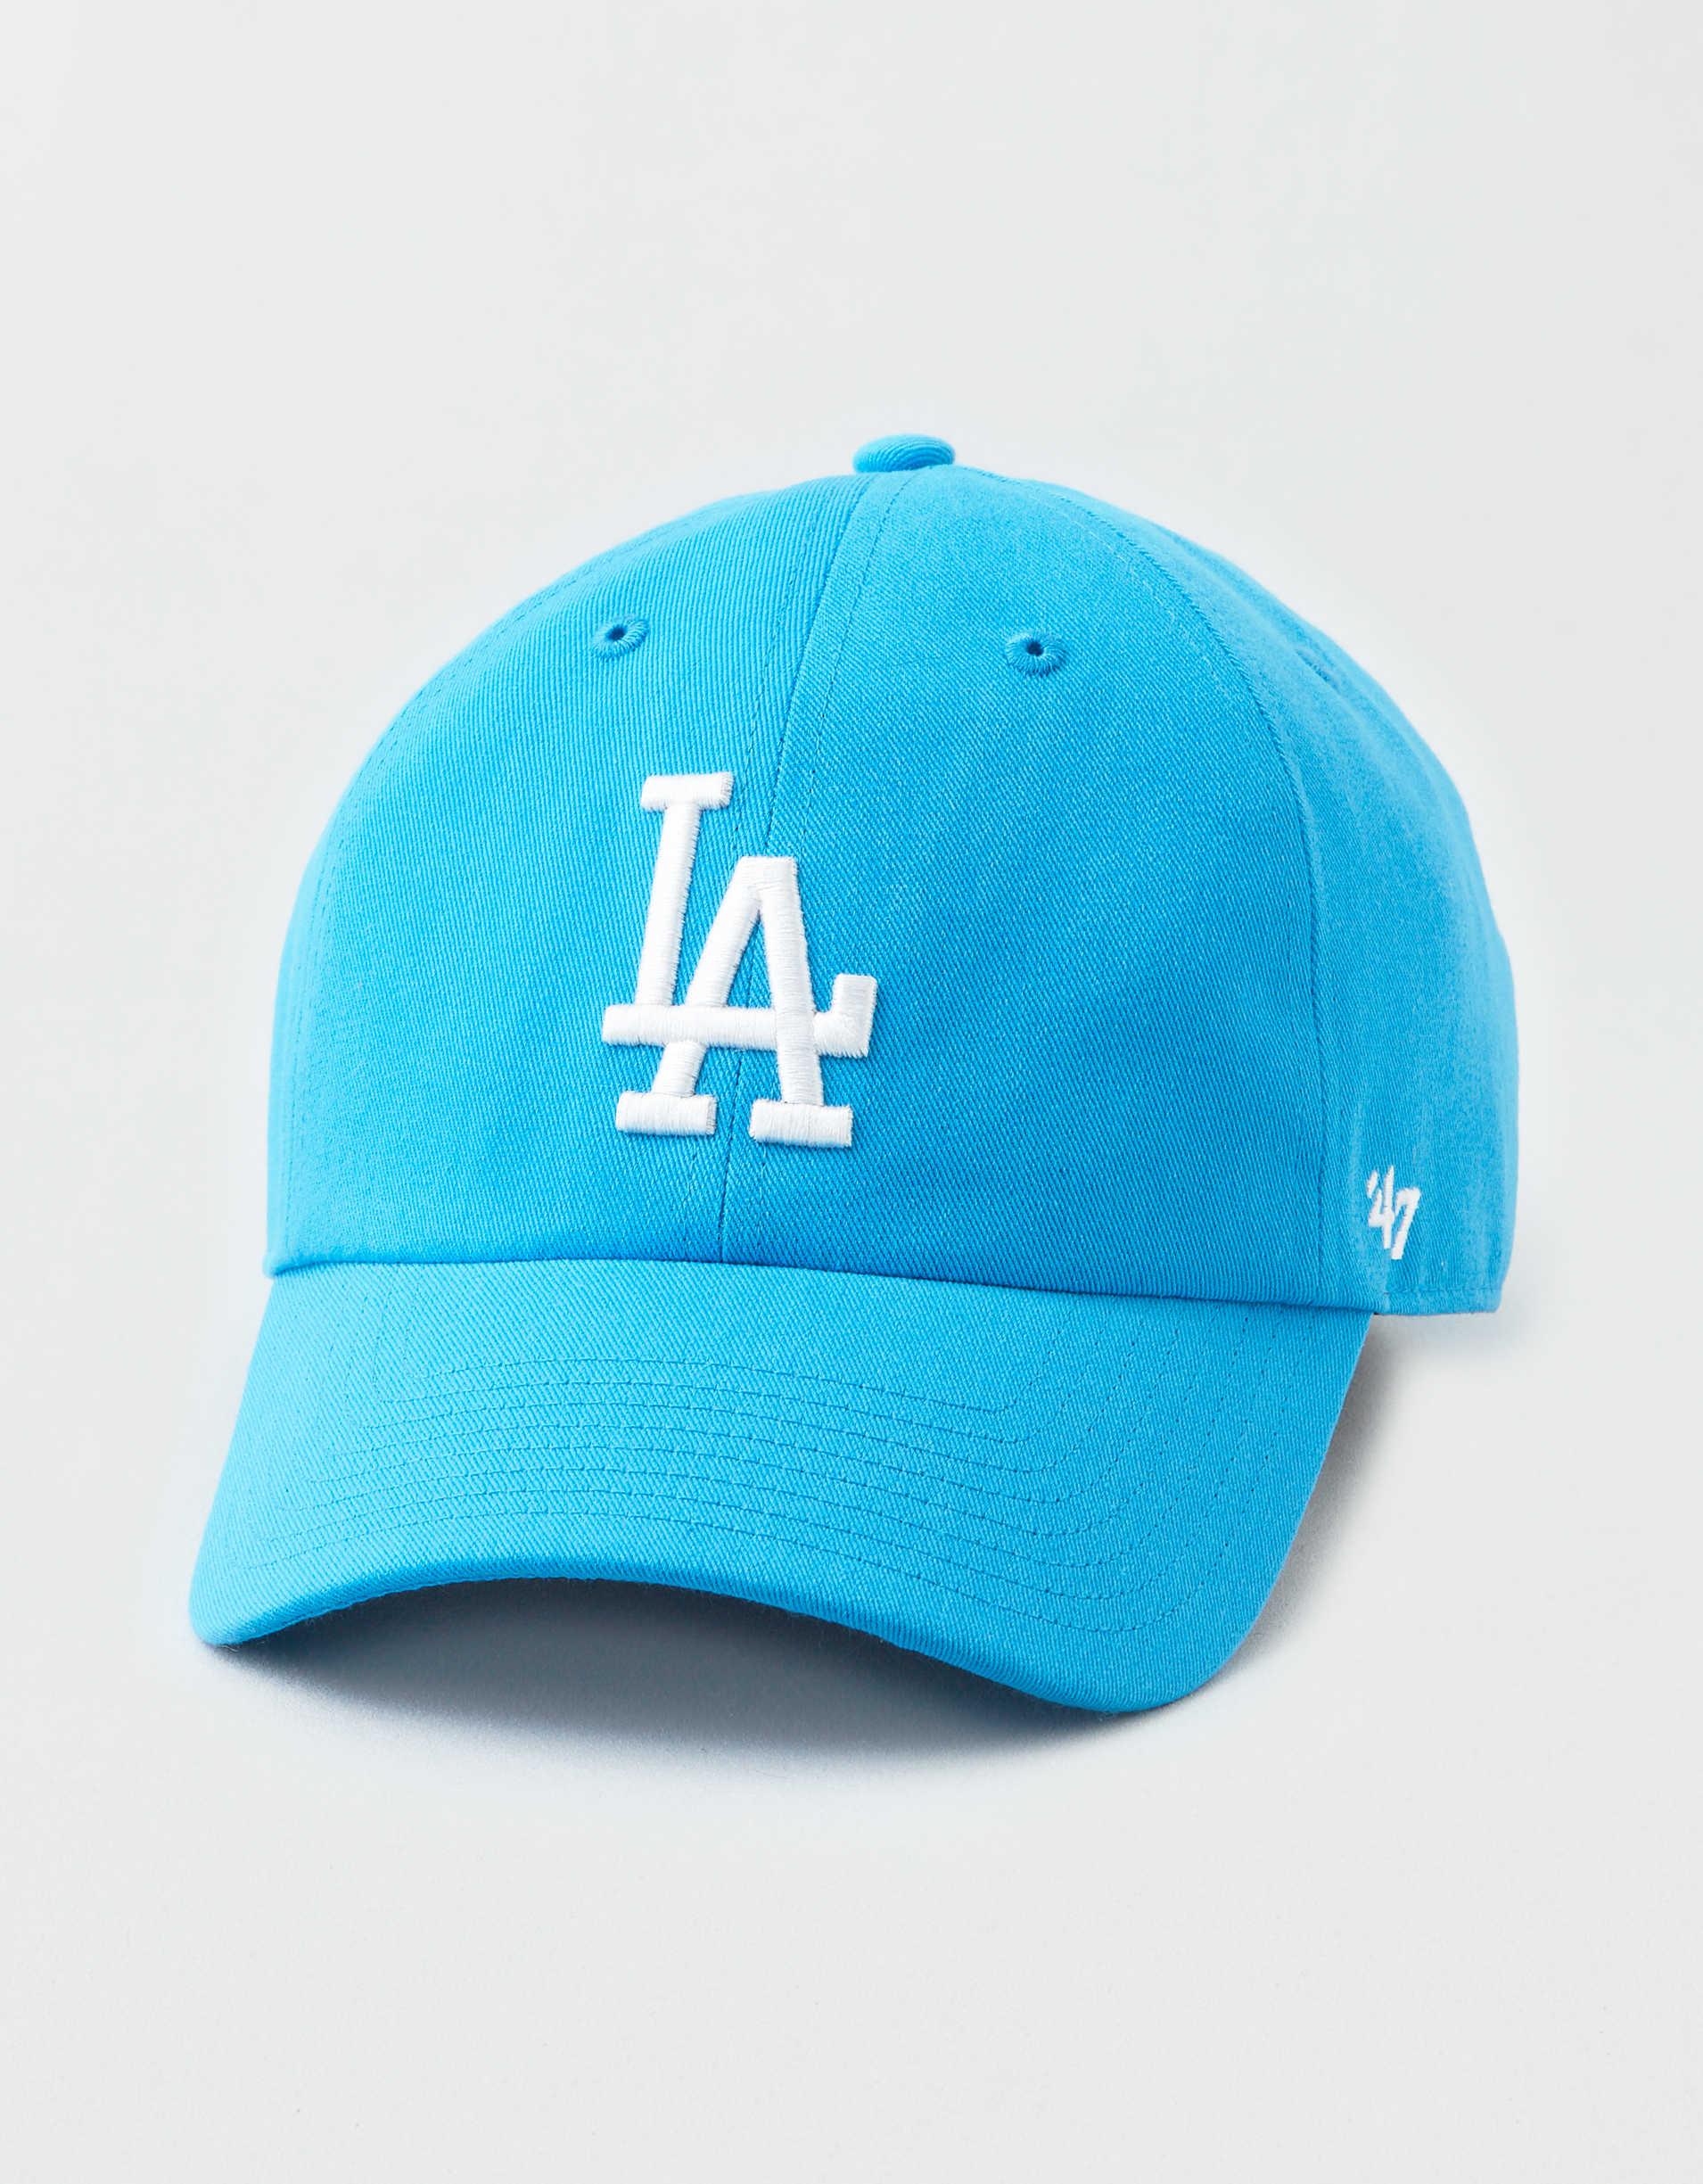 Los Angeles LA Dodgers 47 Brand Womens MLB Neon Clean Up Baseball Cap Hat Blue